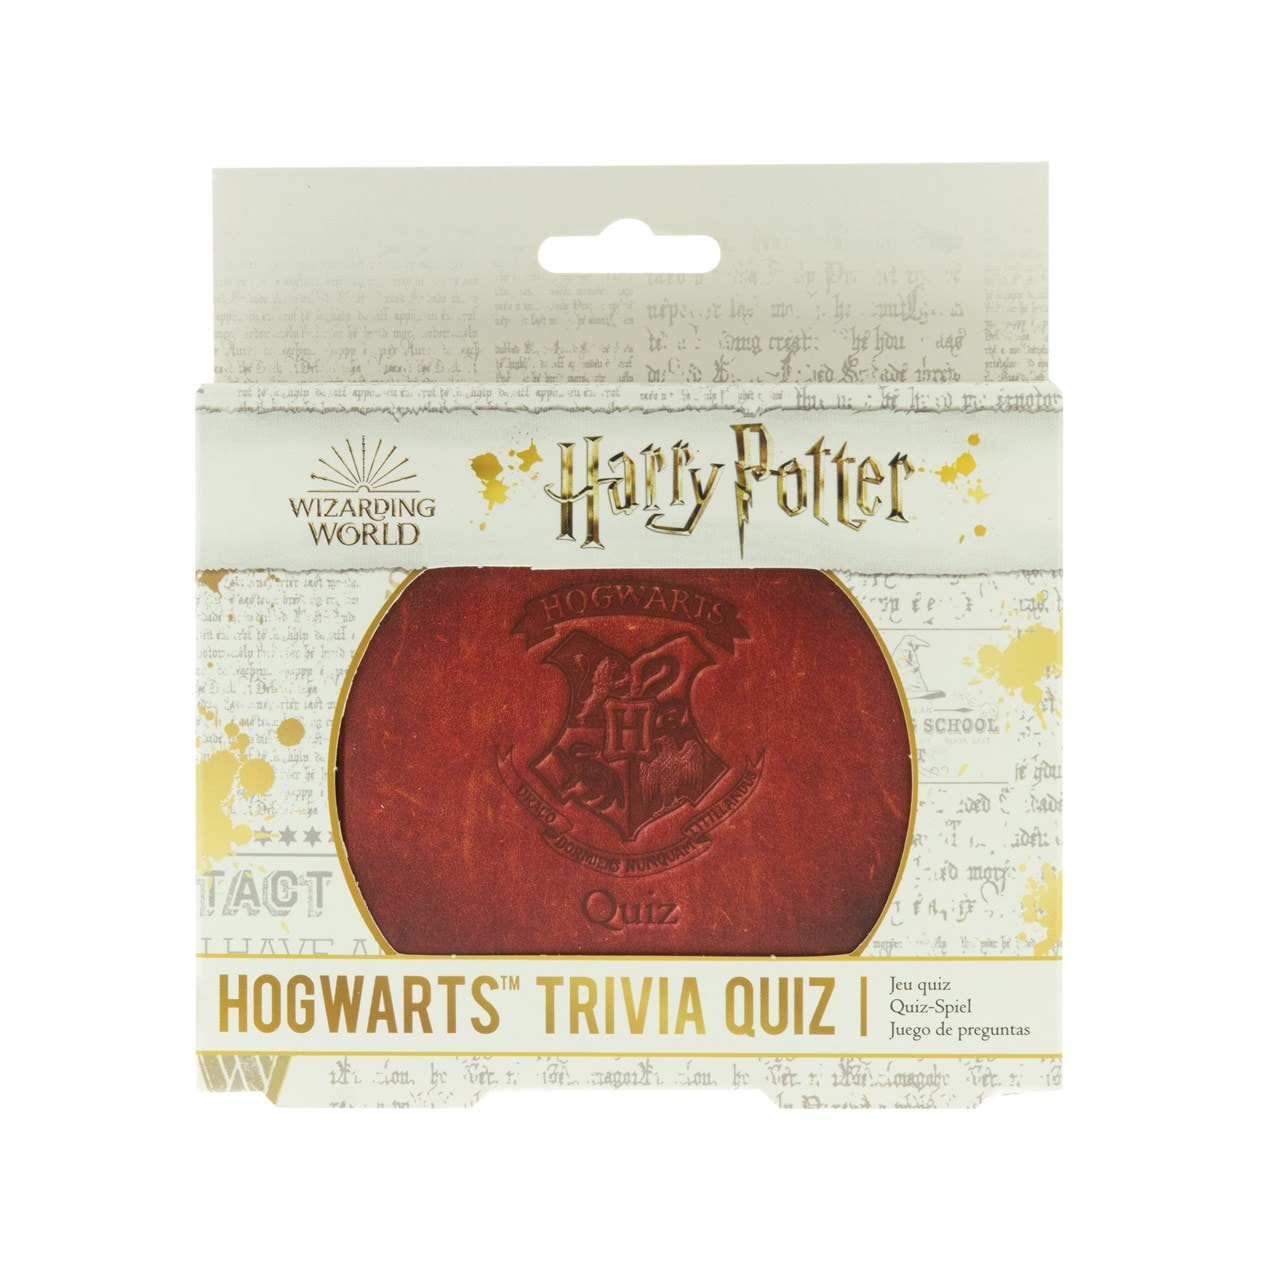 Harry Potter Hogwarts Trivia Quiz - 1